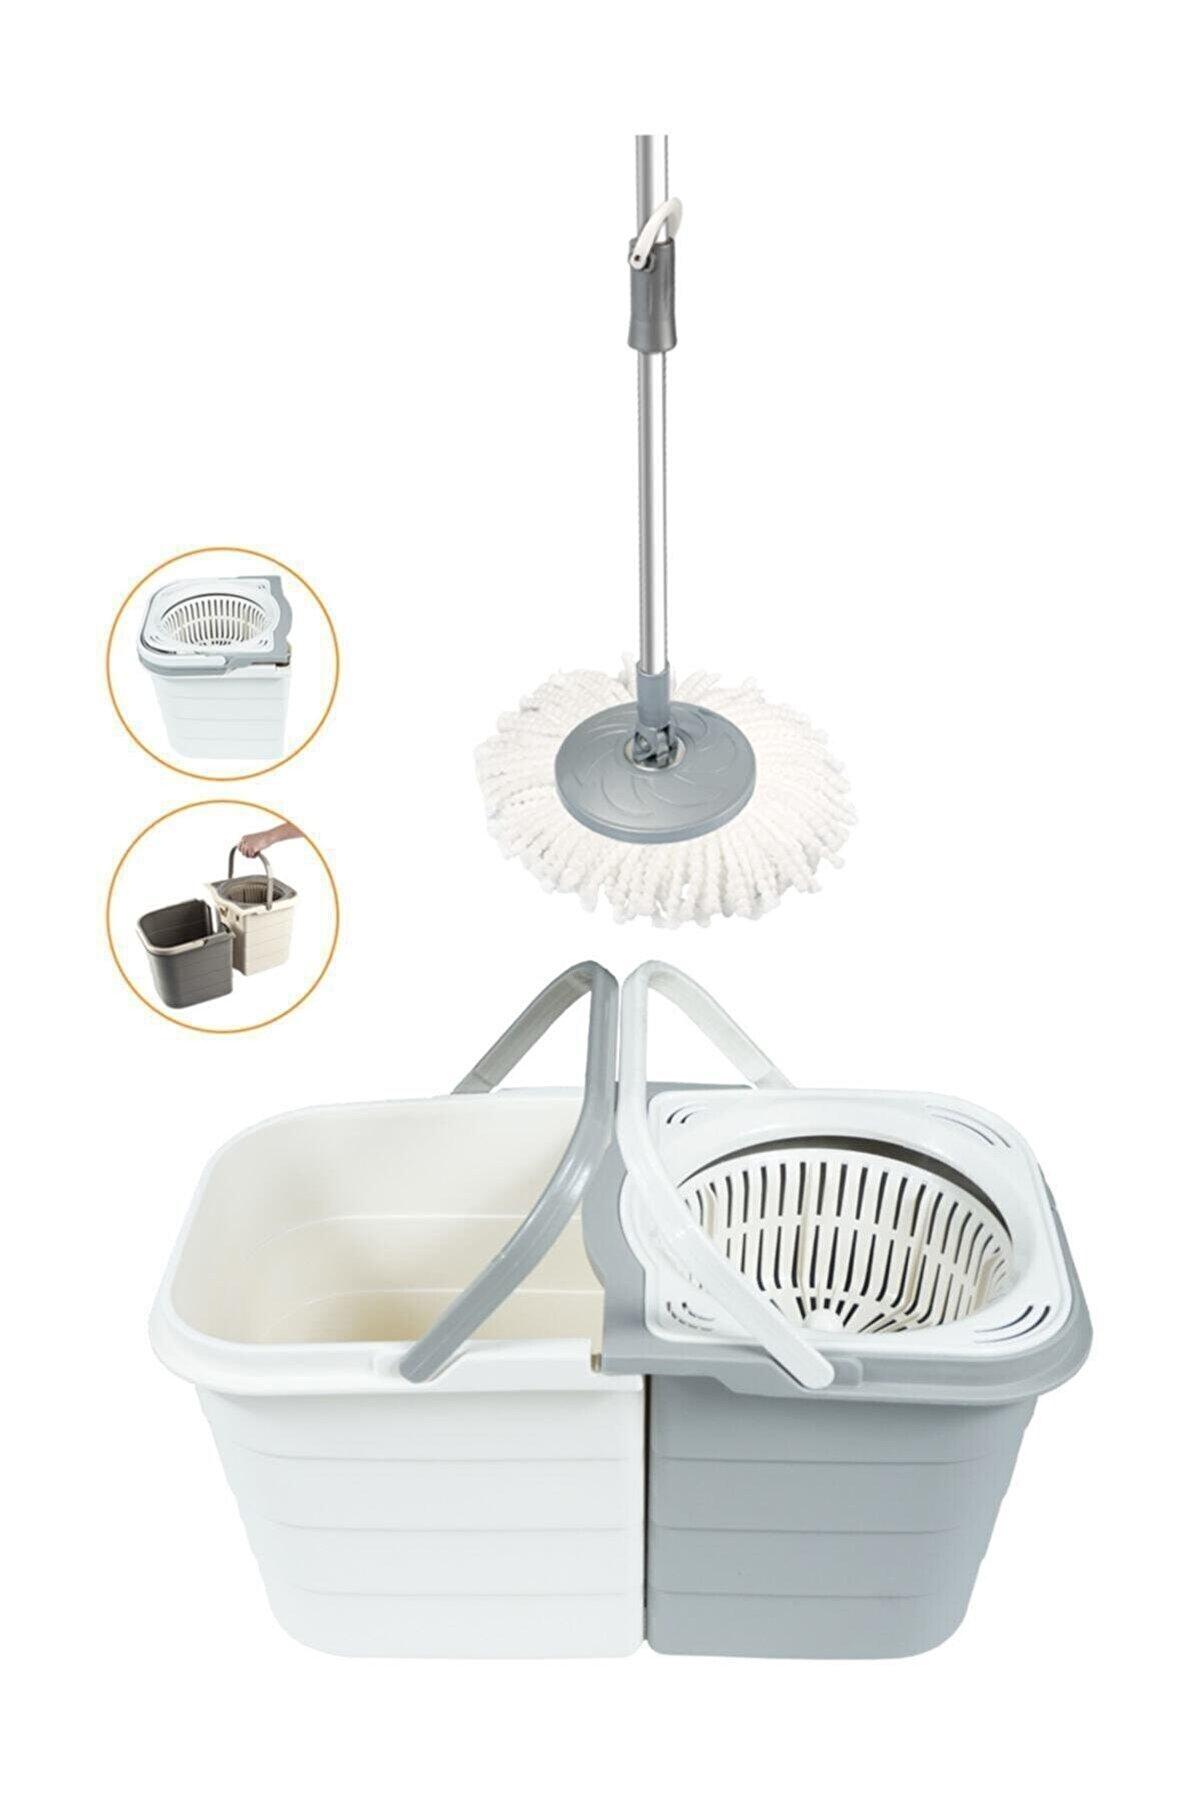 Spin Mop Duo 19 Litre Kirli Su Temiz Su Ayrı Yeni Temizlik Seti